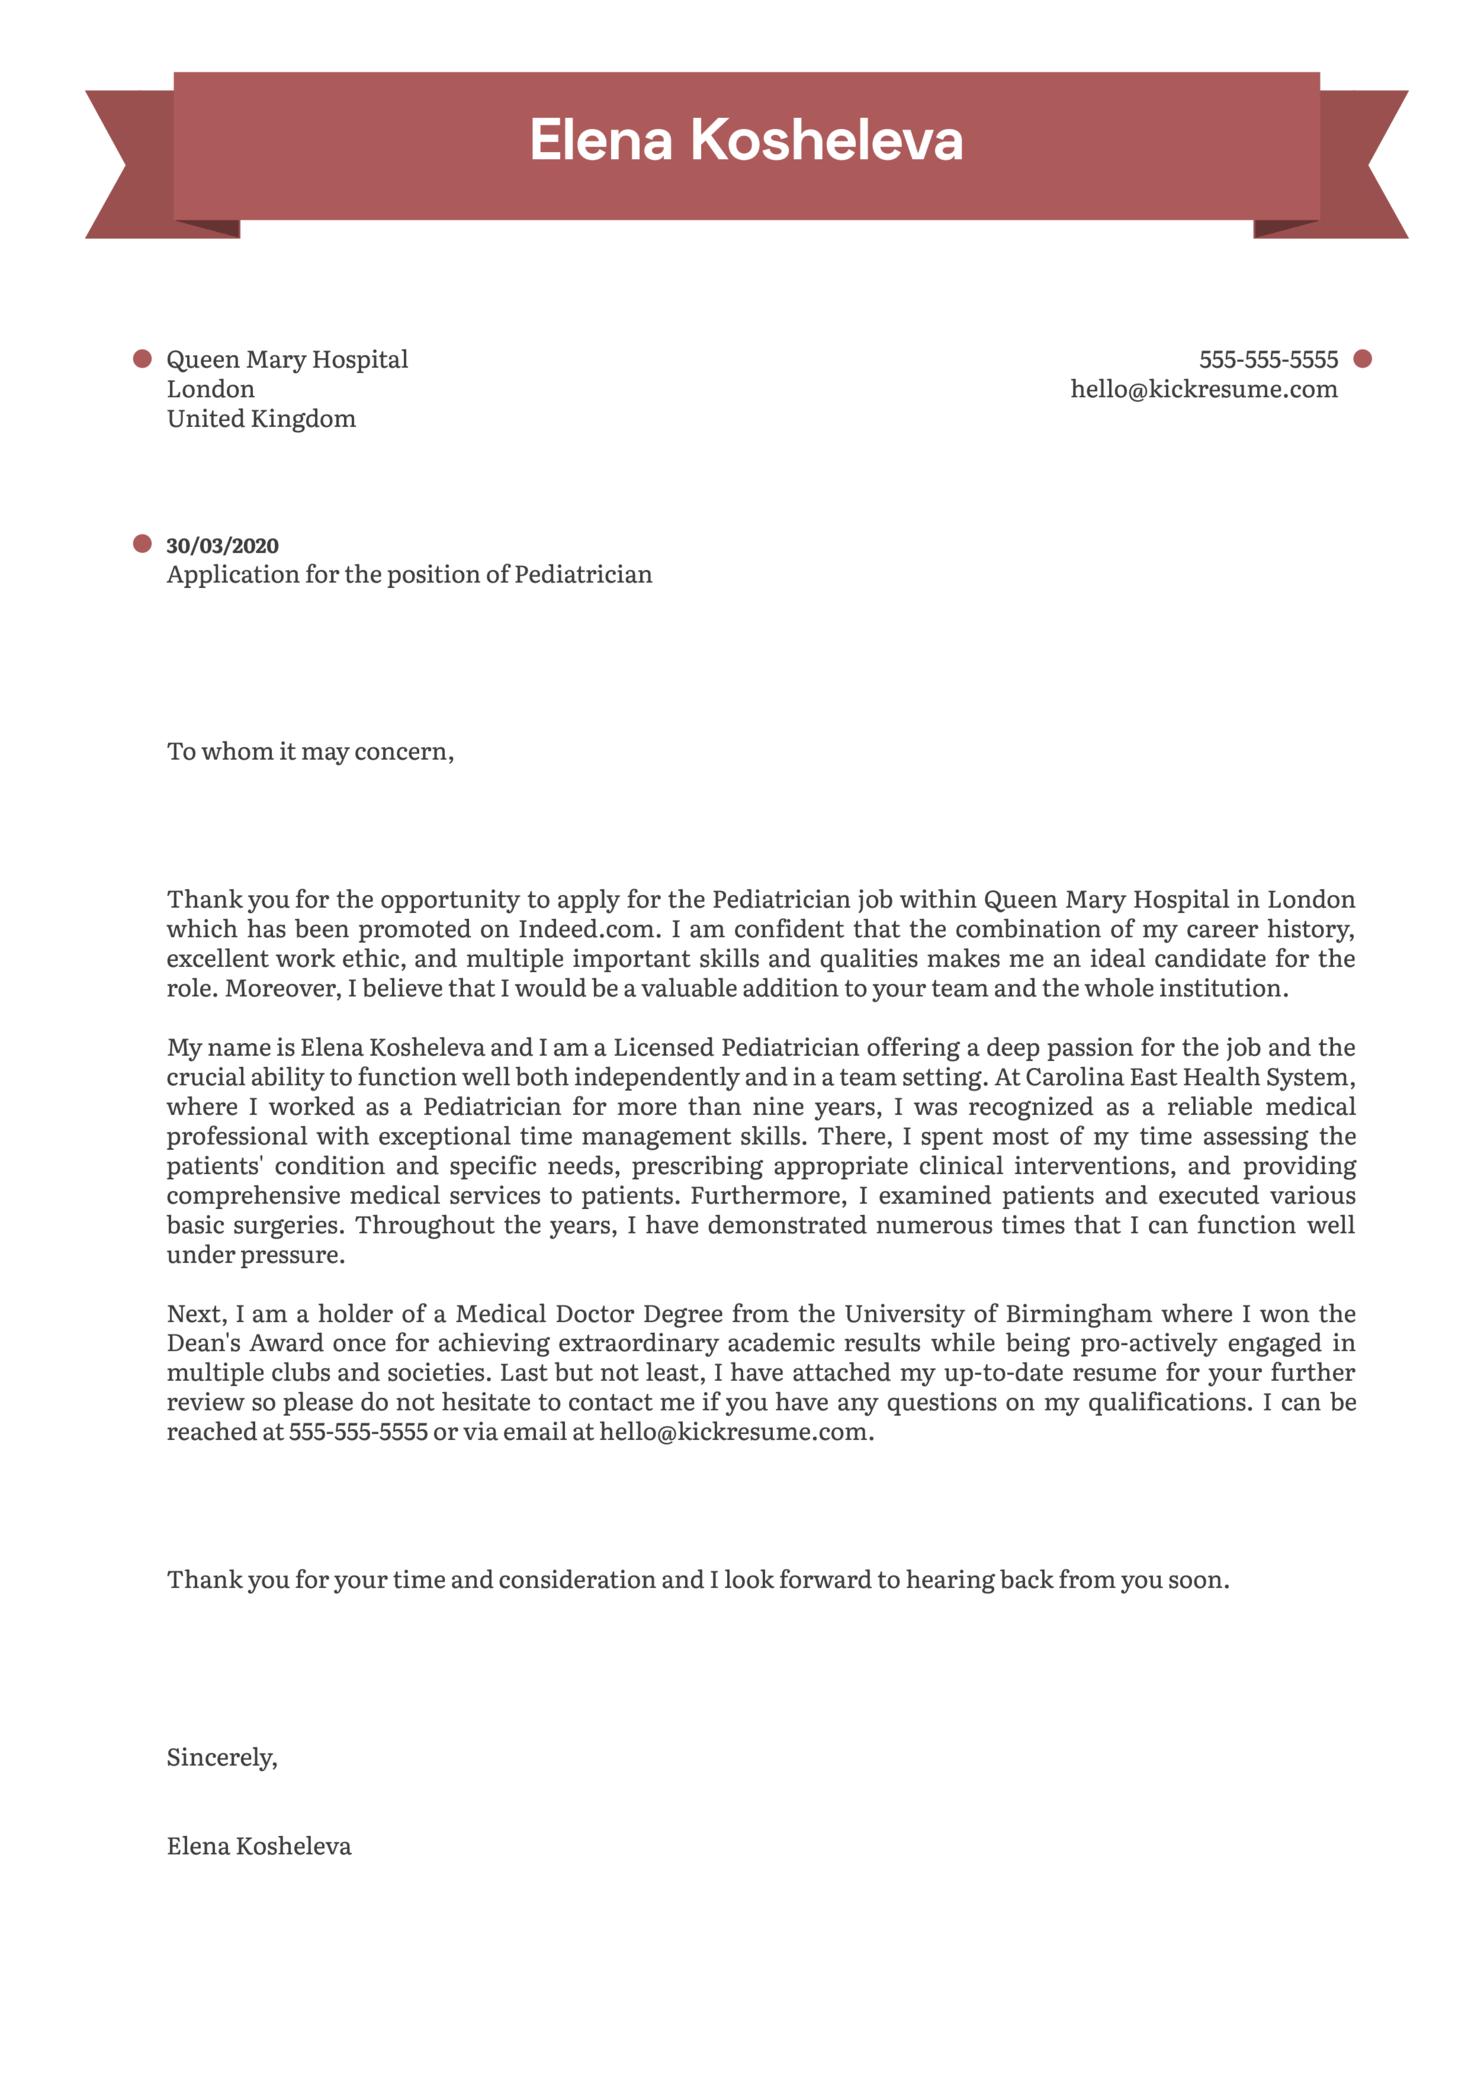 Pediatrician Cover Letter Sample